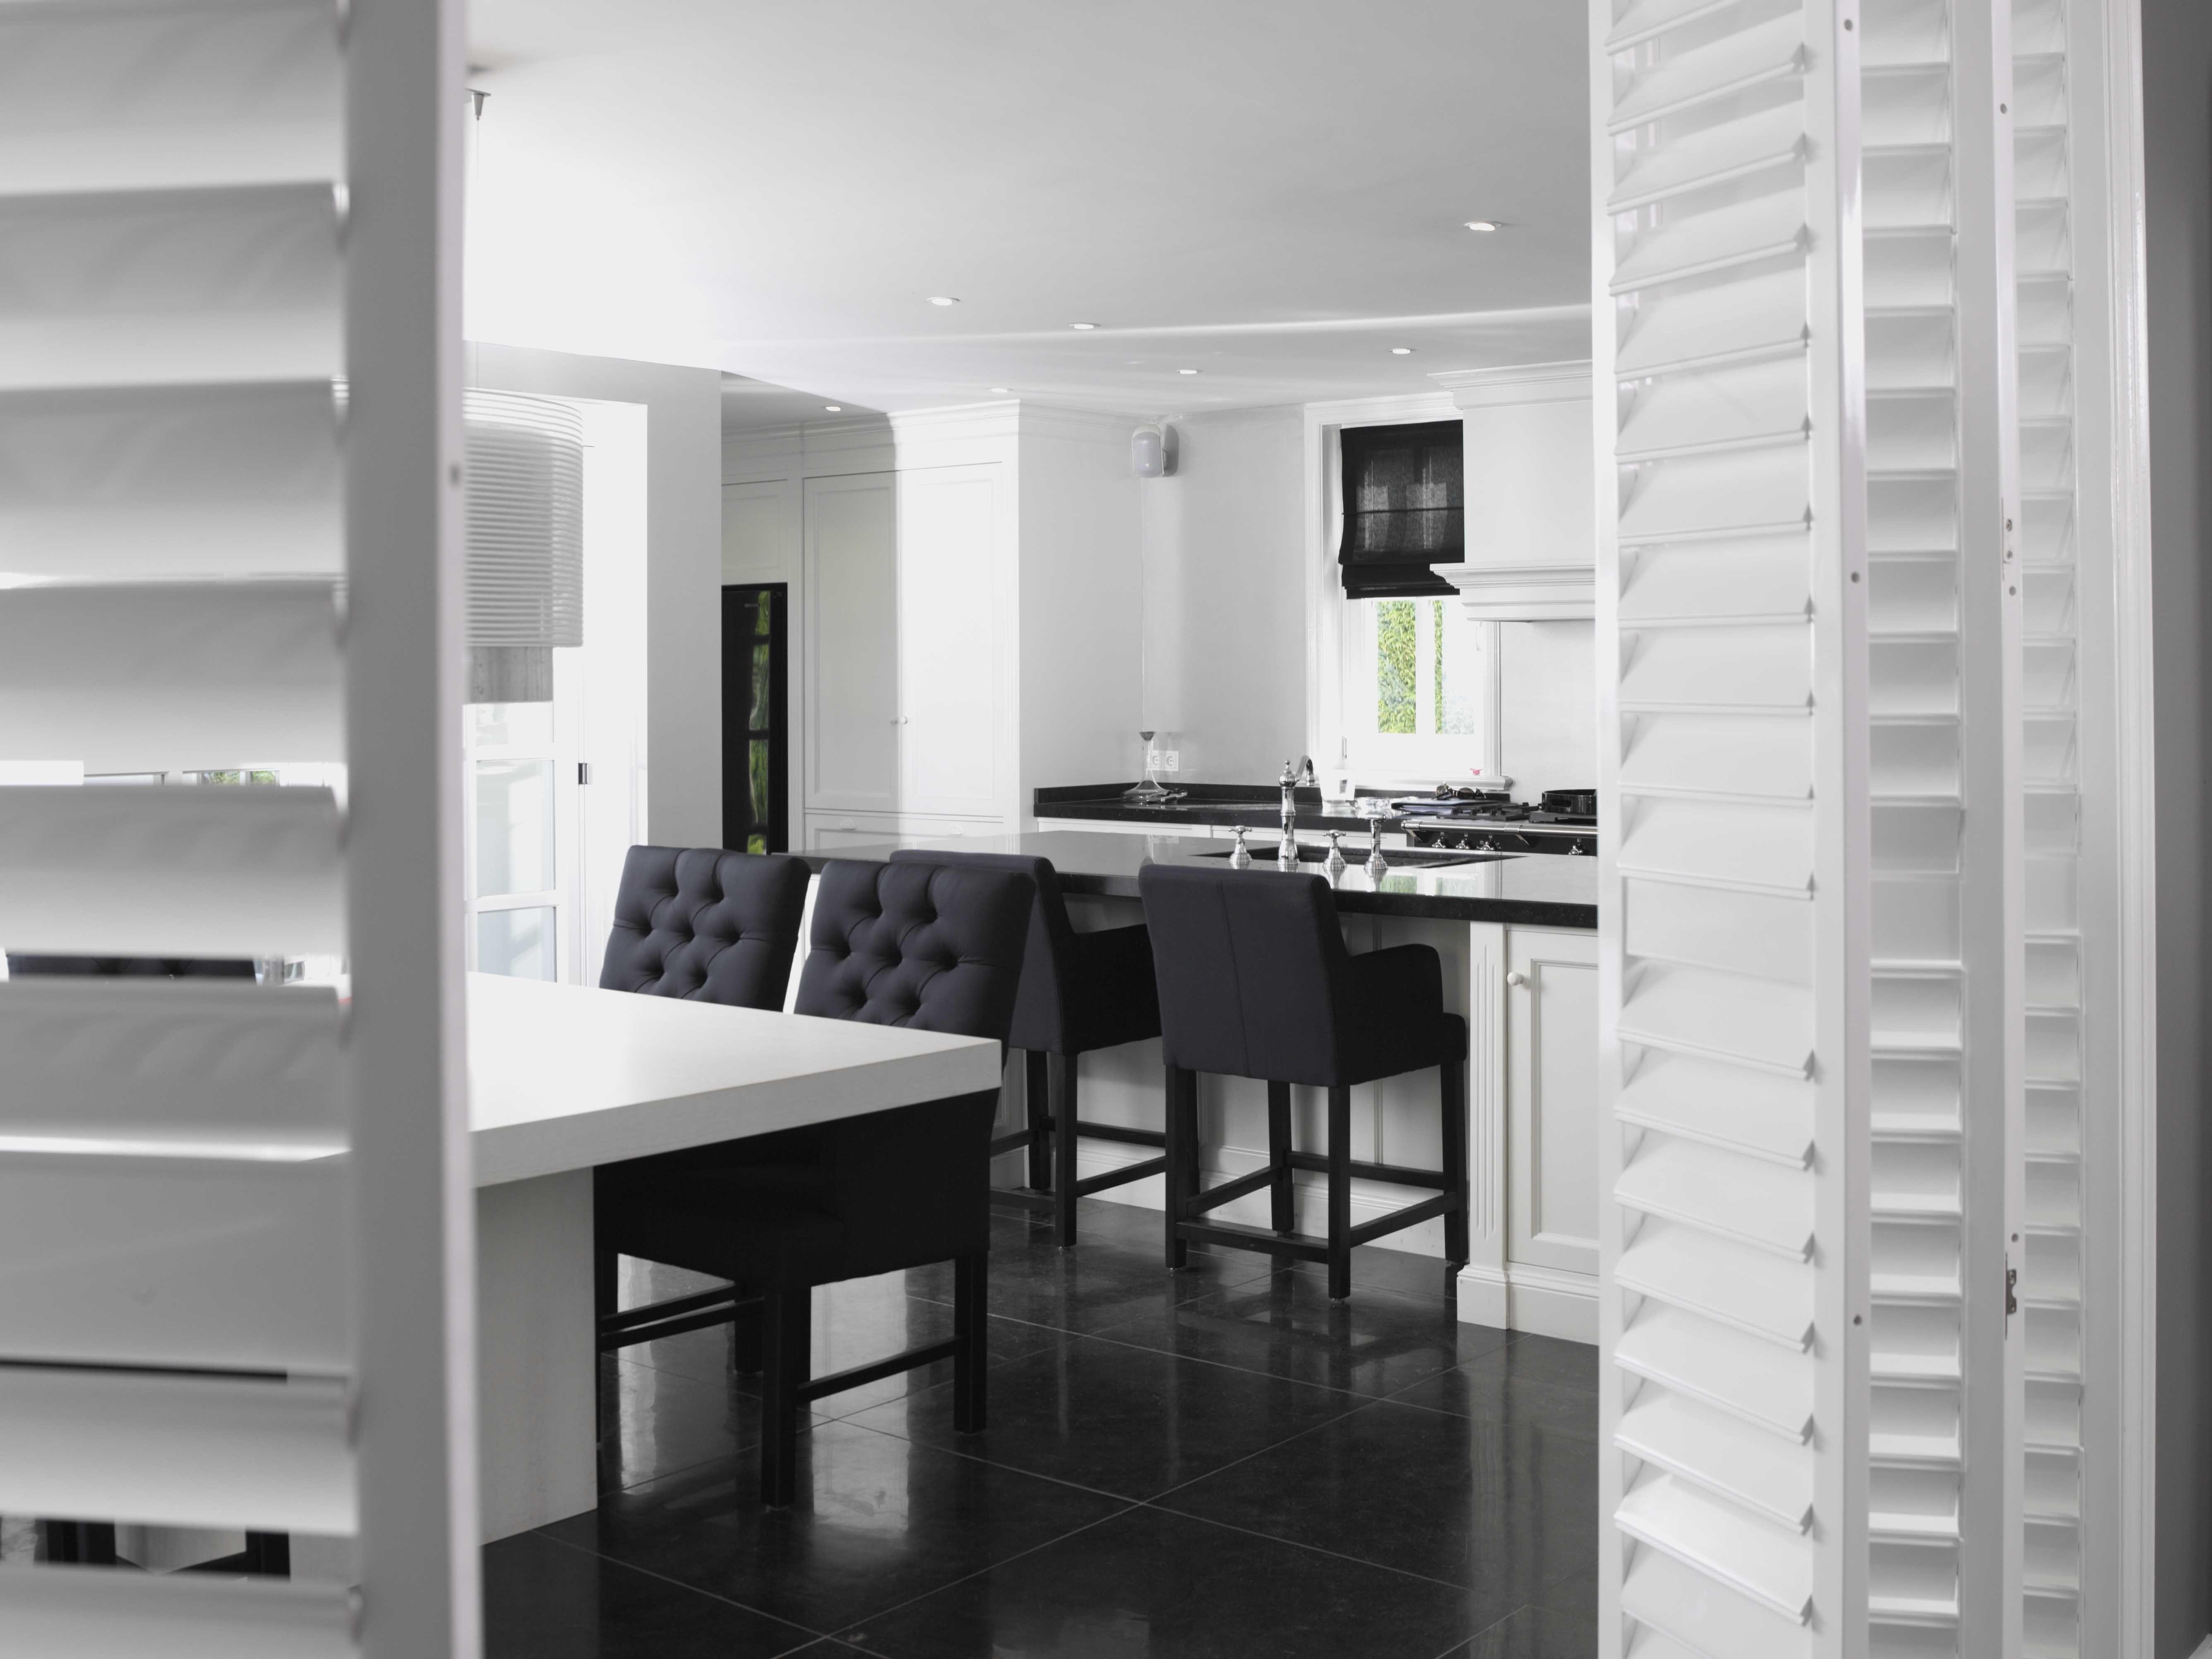 Gordijn Als Scheidingswand : Shutters vouwrailsysteem als scheidingswand in zwart witte keuken